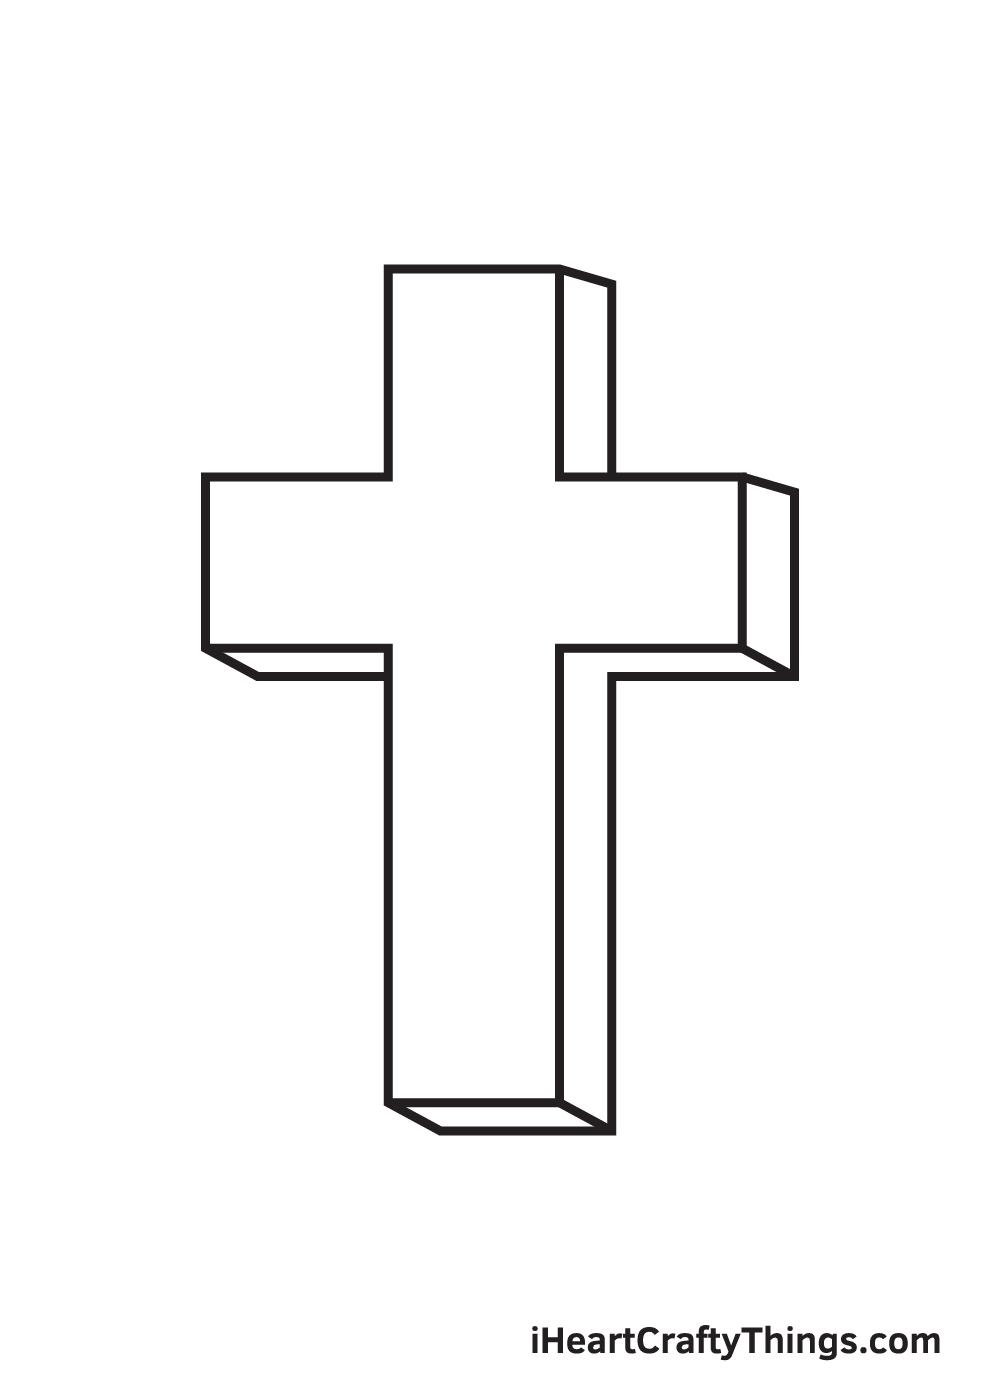 cross drawing - step 8